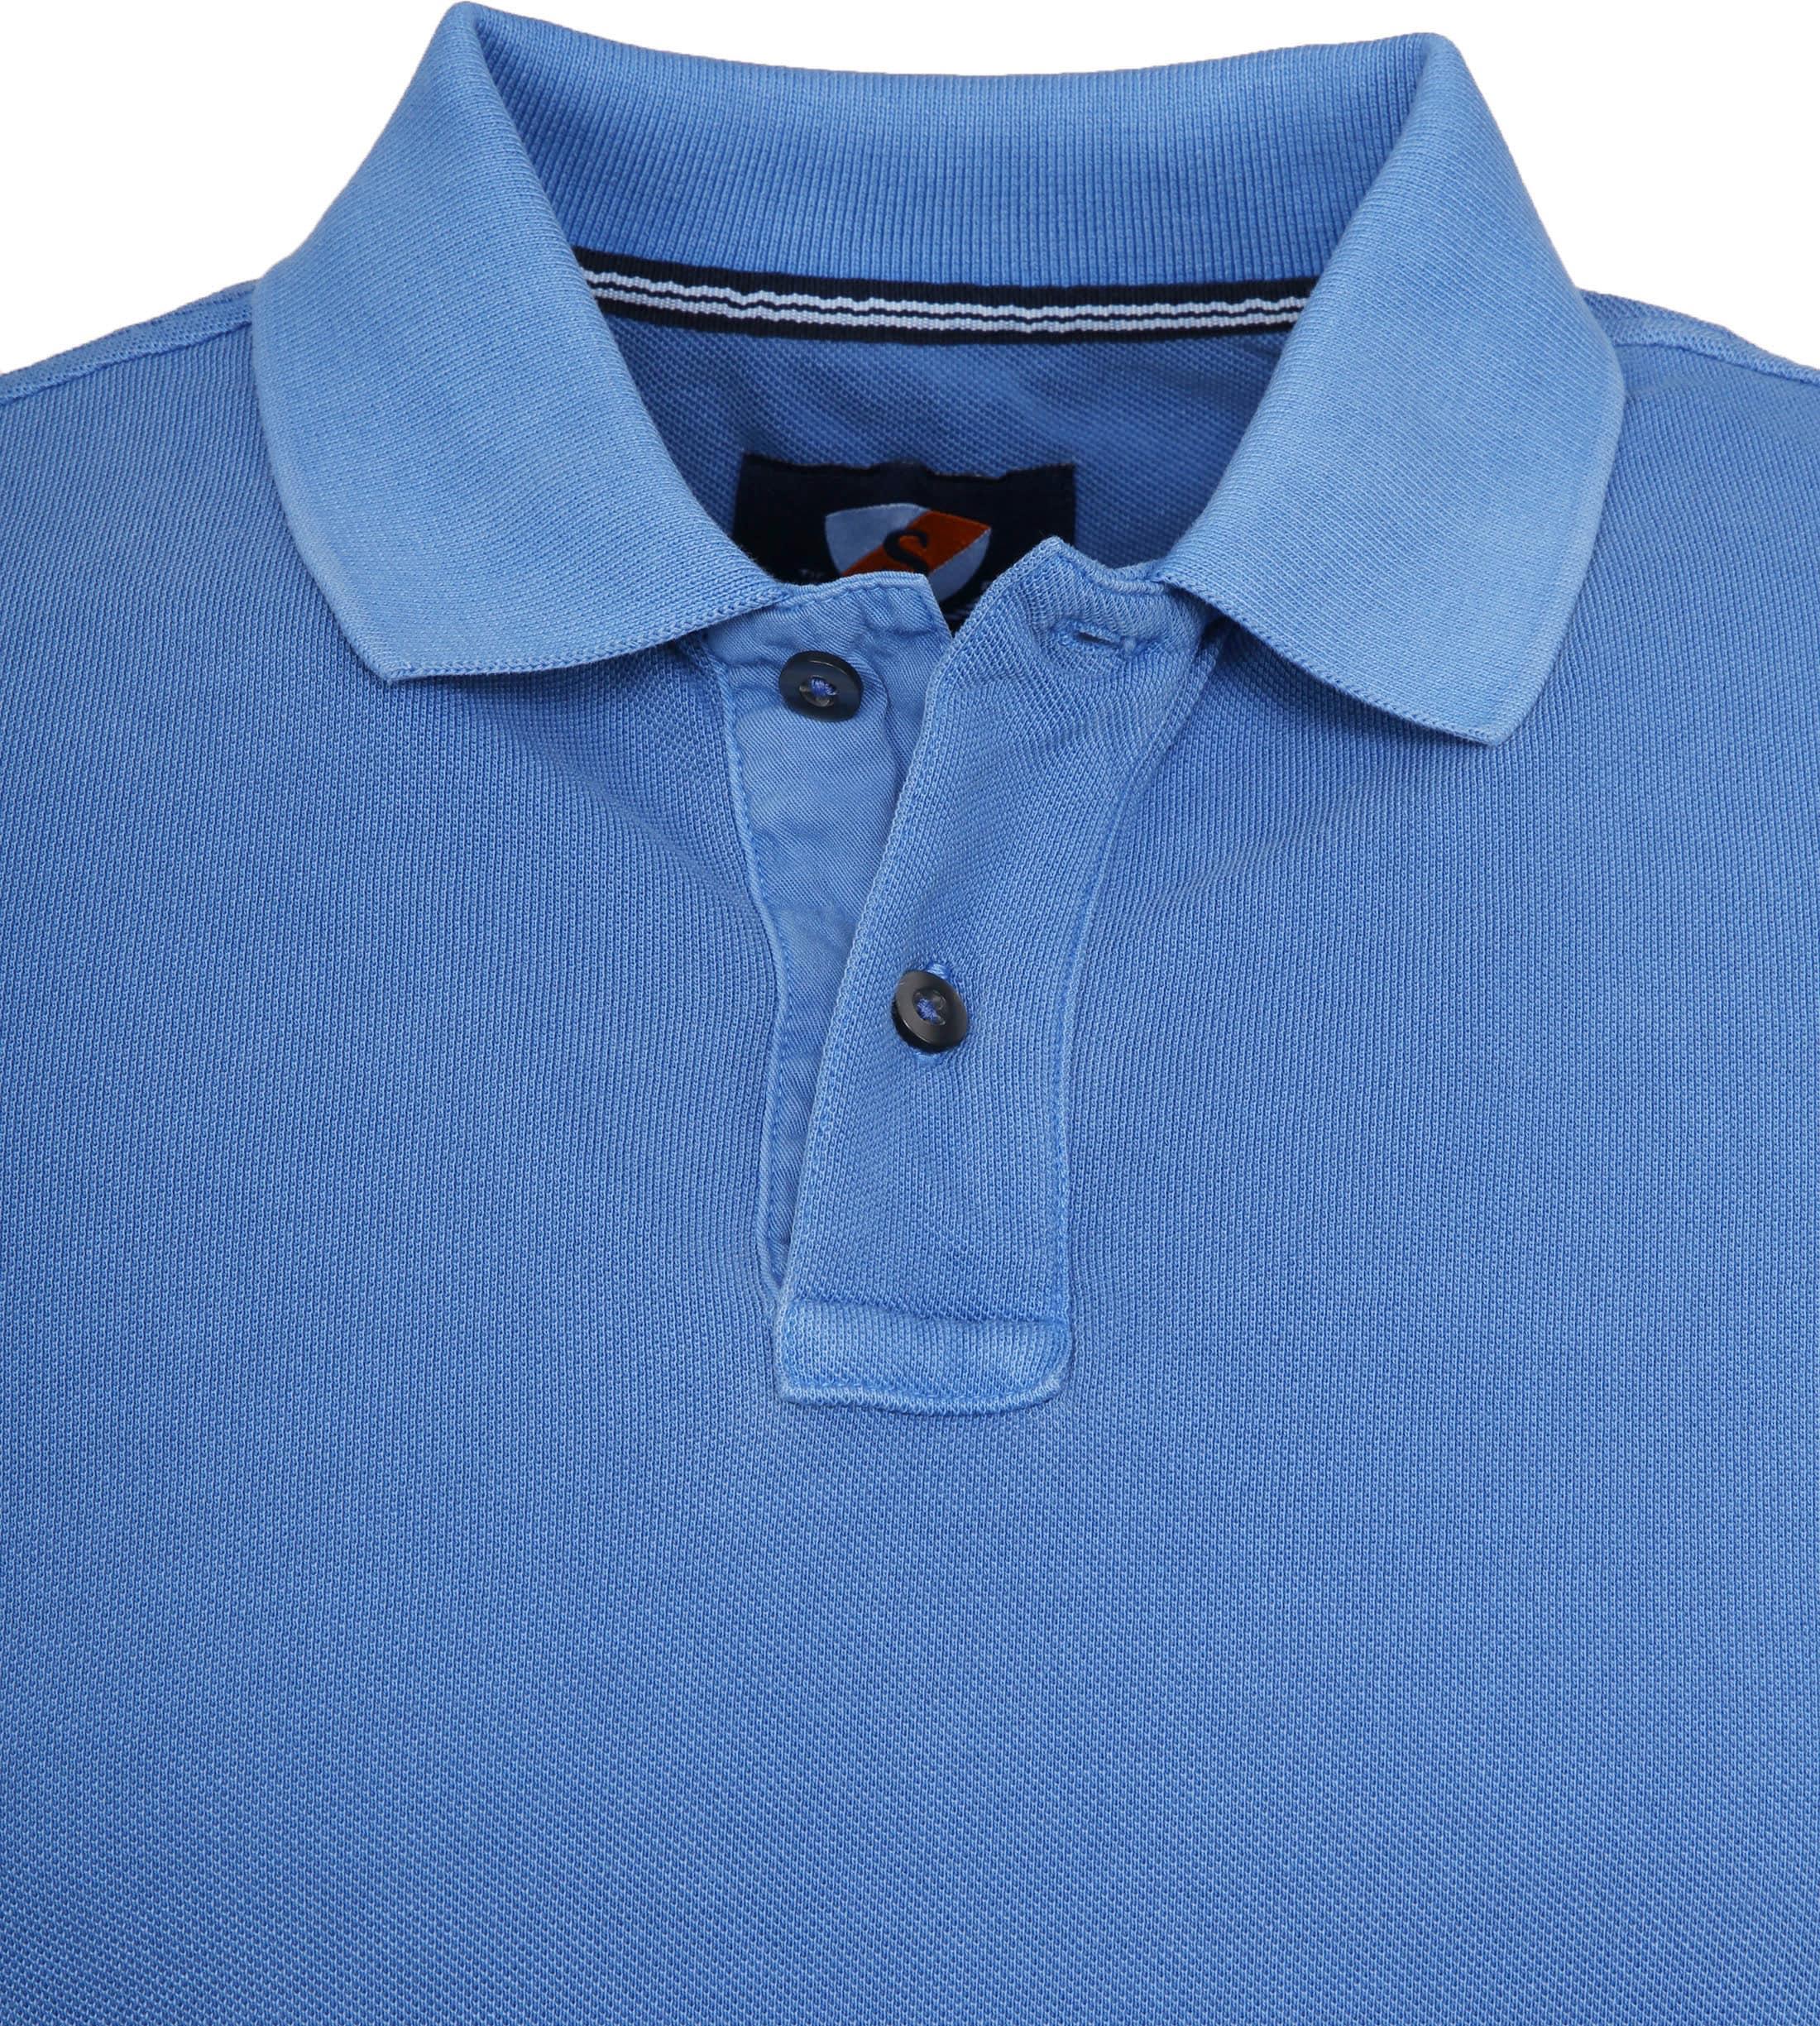 Suitable Stone Wash Poloshirt Blue foto 1